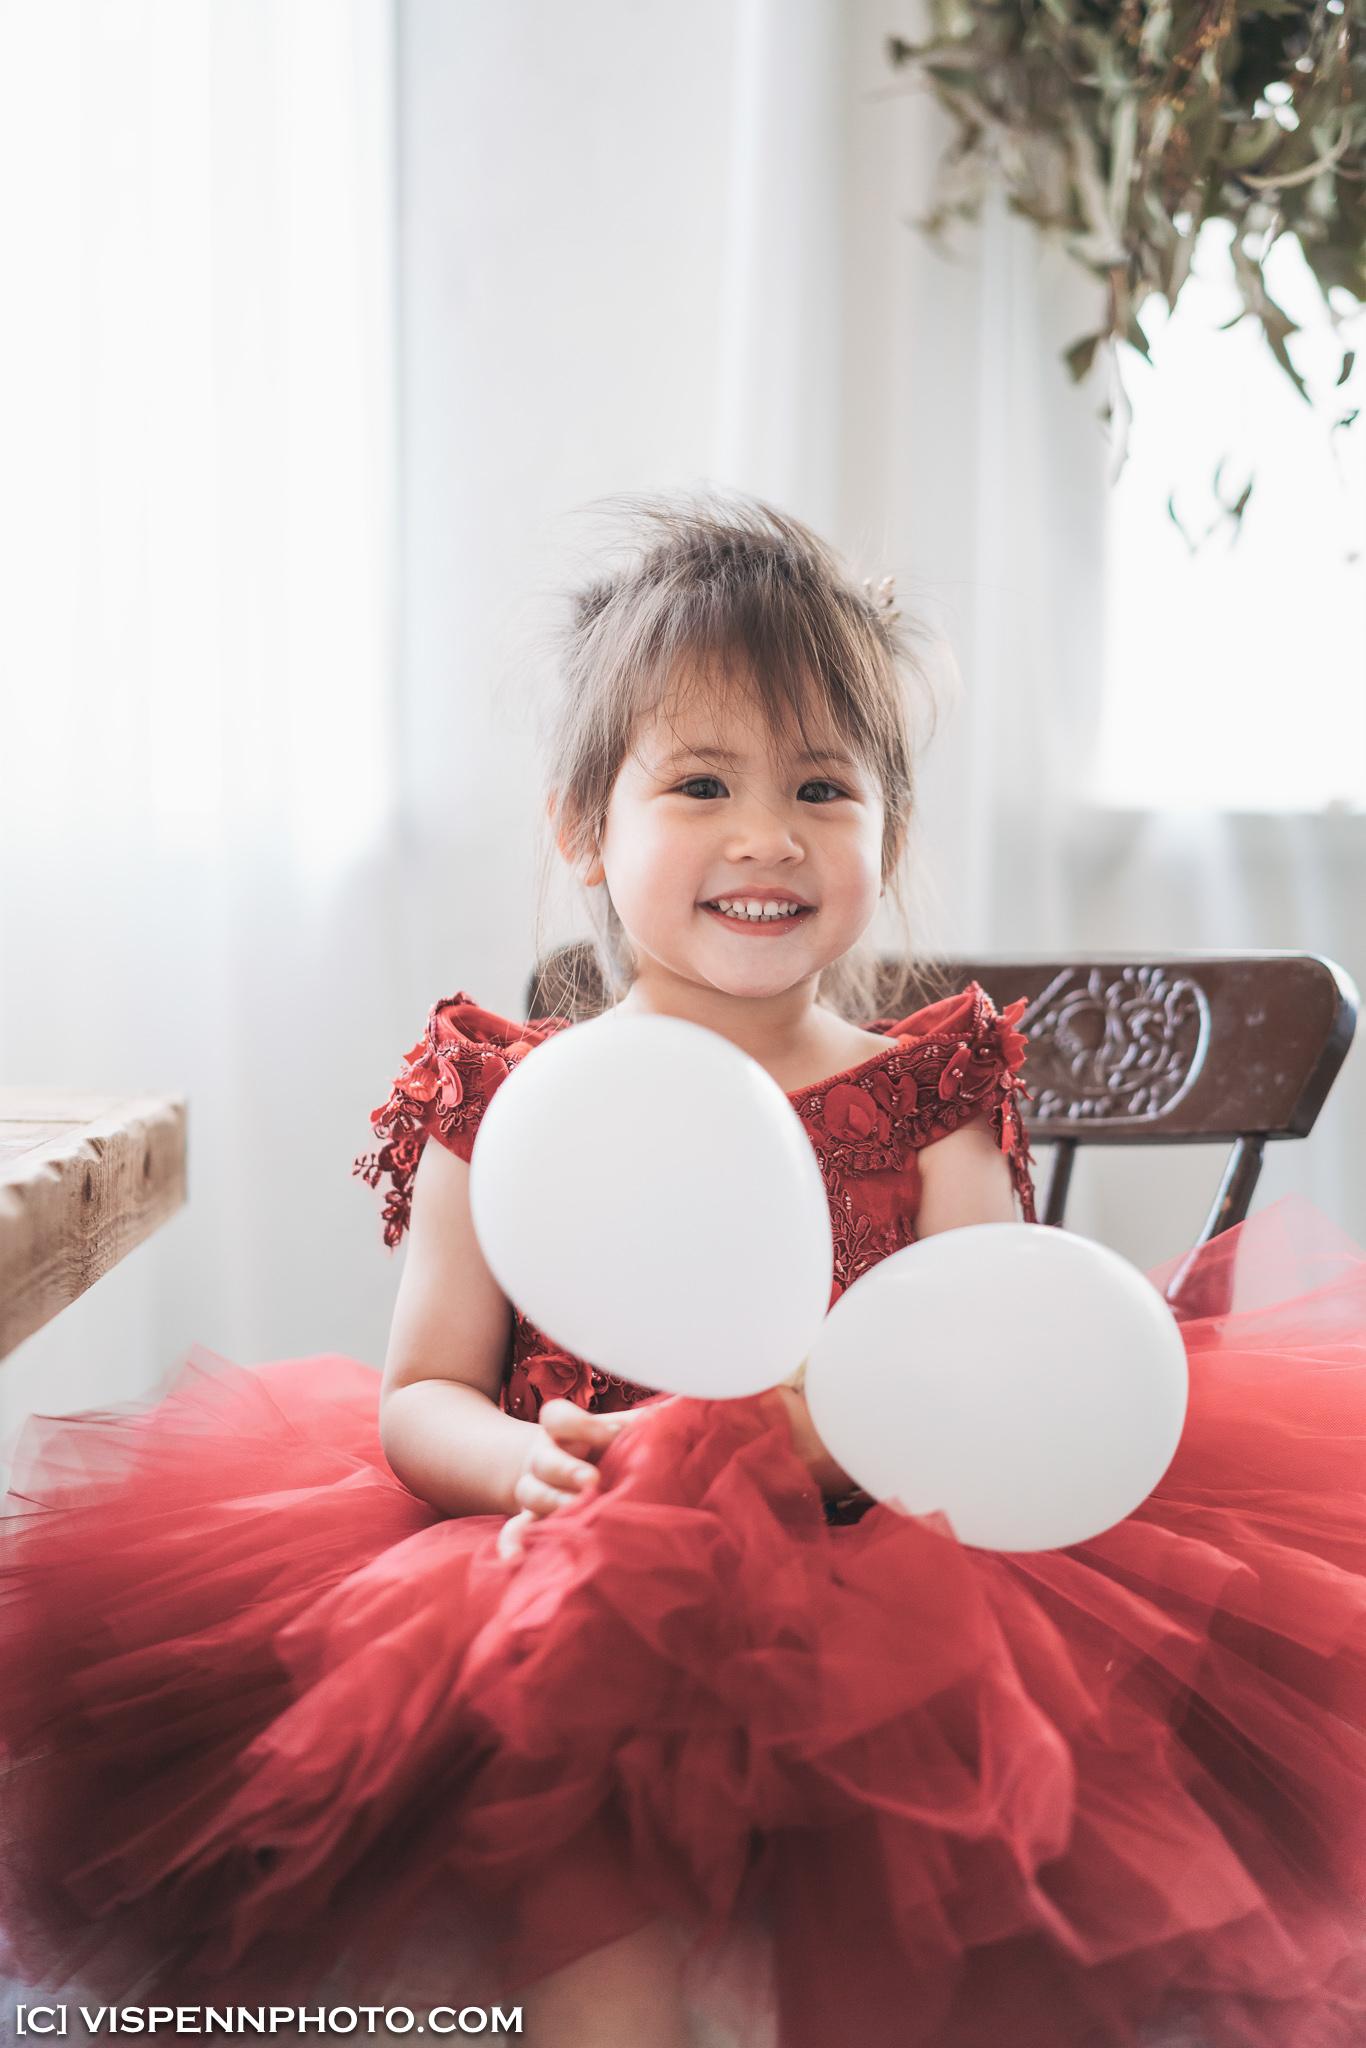 Melbourne Baby Family Birthday Party Photographer 墨尔本 百日宴 满月宴 周岁宴 摄影 VISPENN ALINA 0243 Sony VISPENN